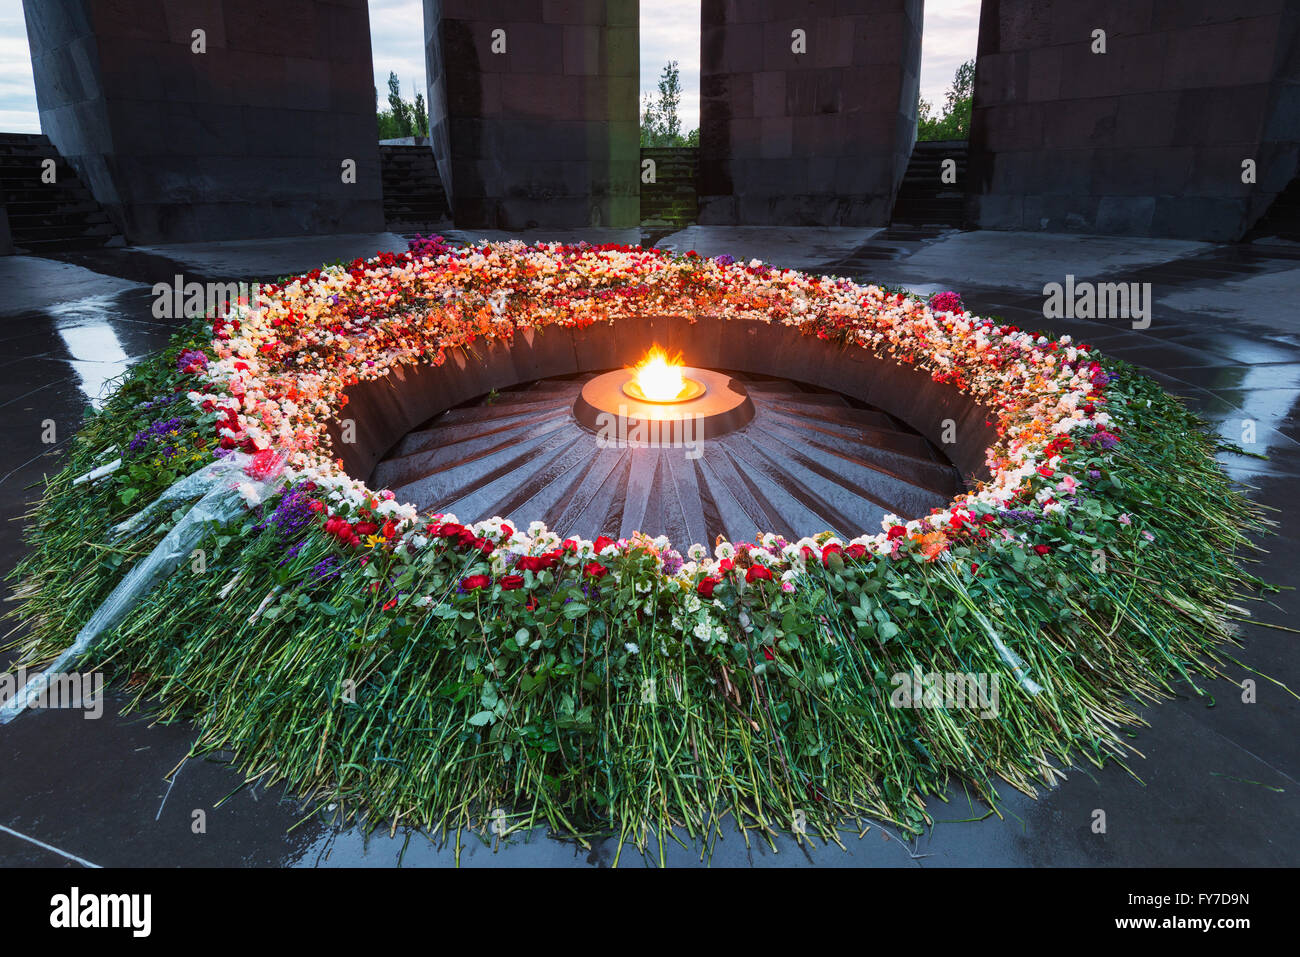 Eurasia, Caucasus region, Armenia, Yerevan, genocide memorial - Stock Image